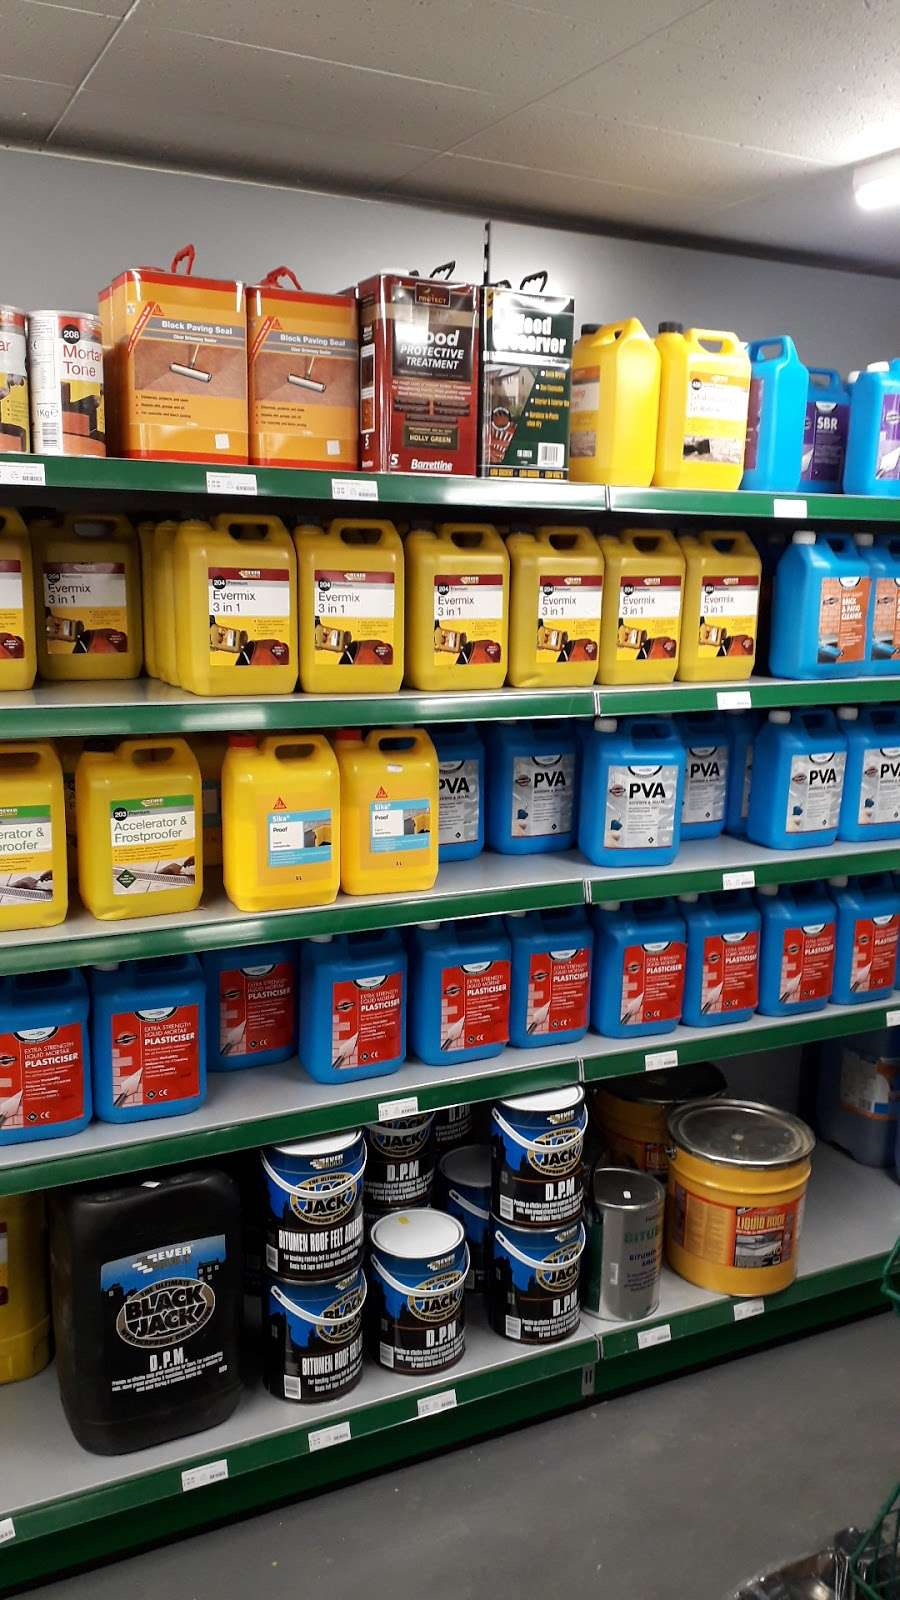 OTBS - home goods store  | Photo 7 of 10 | Address: Upland House, Upland Rd, Bexleyheath DA7 4NR, UK | Phone: 020 8304 8777